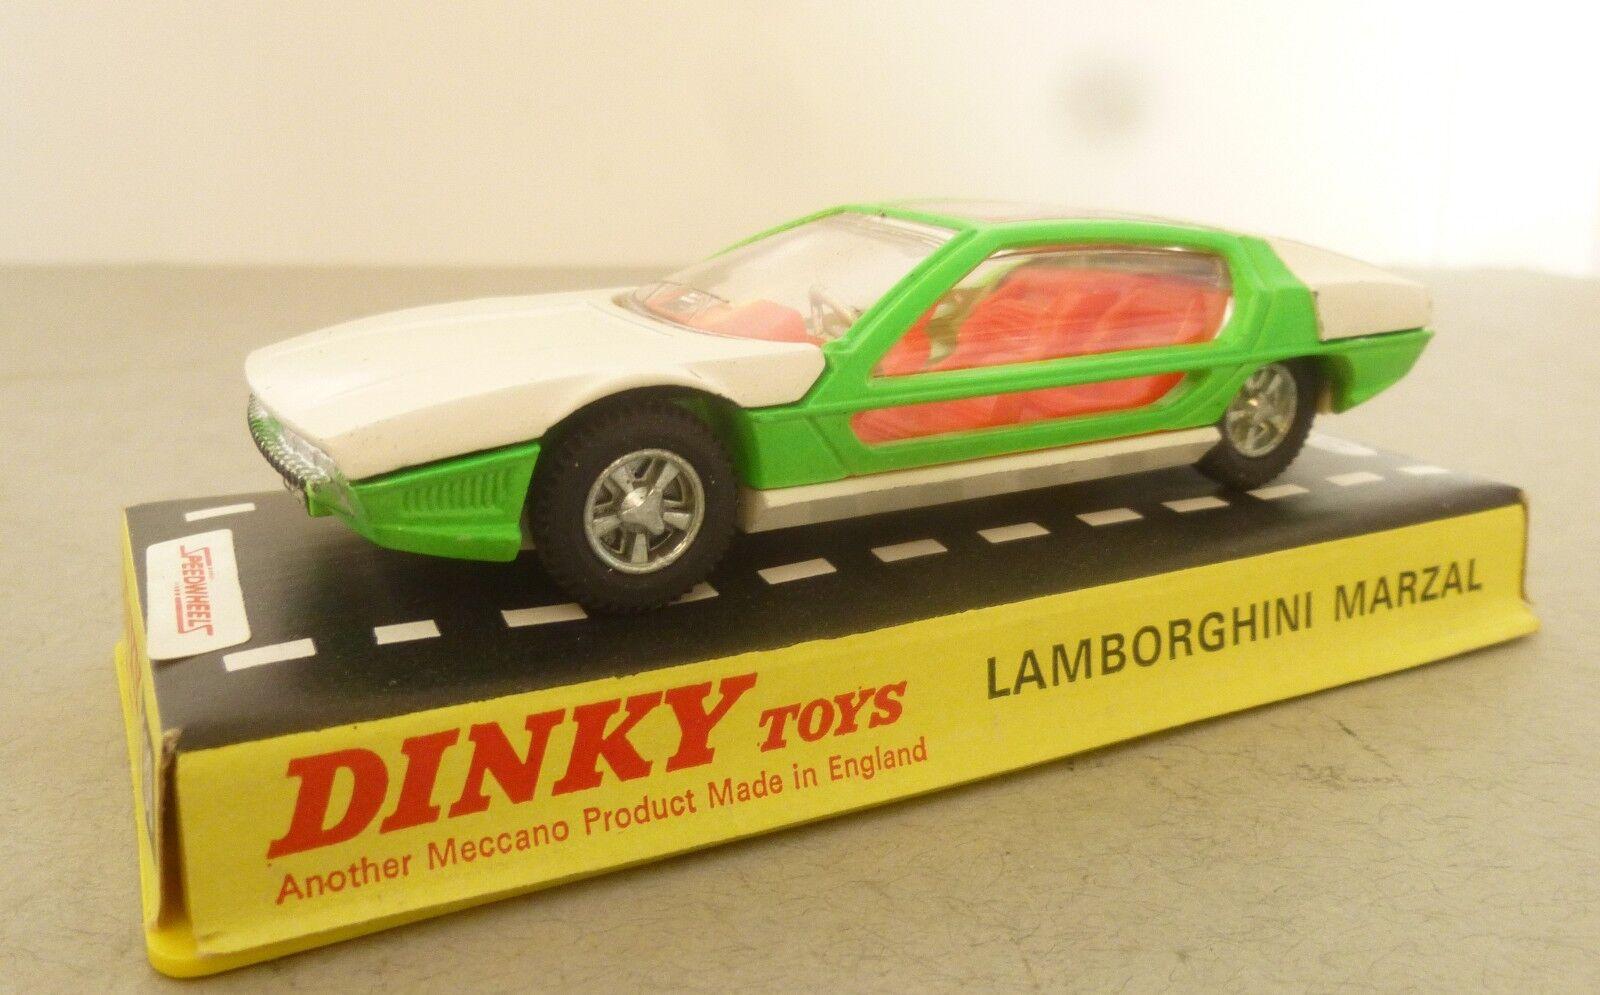 Dinky Toys Lamborghini Marzal Sports Car - 1970's Dinky Toys Sports Cars